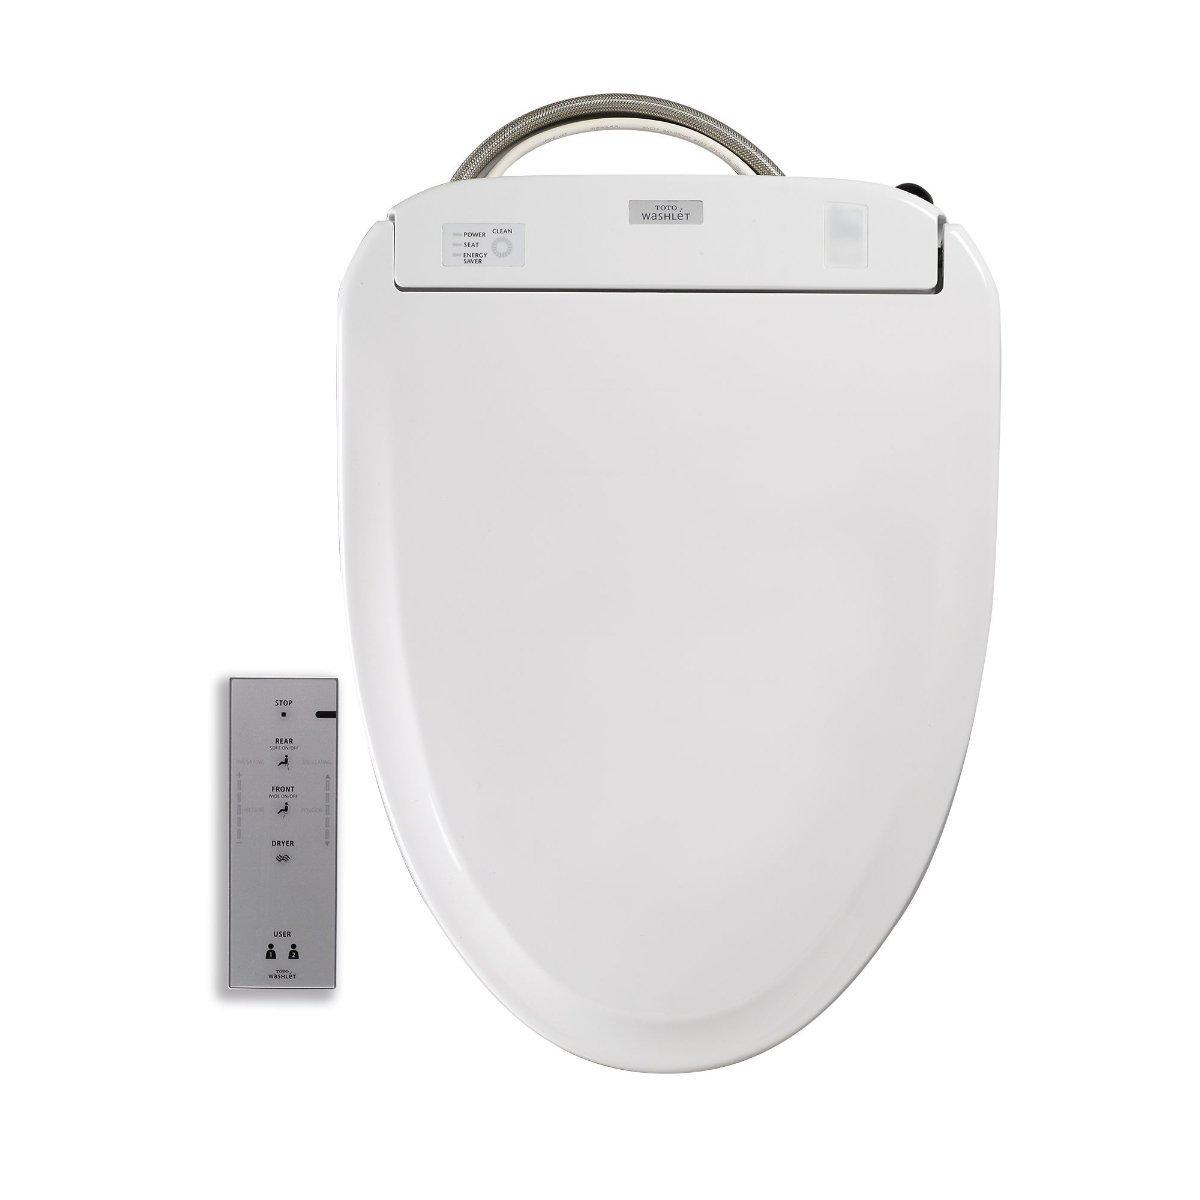 Bradshaw Plumbing - Toto Toilets, Toto Toilet Parts, Lids, Seats ...